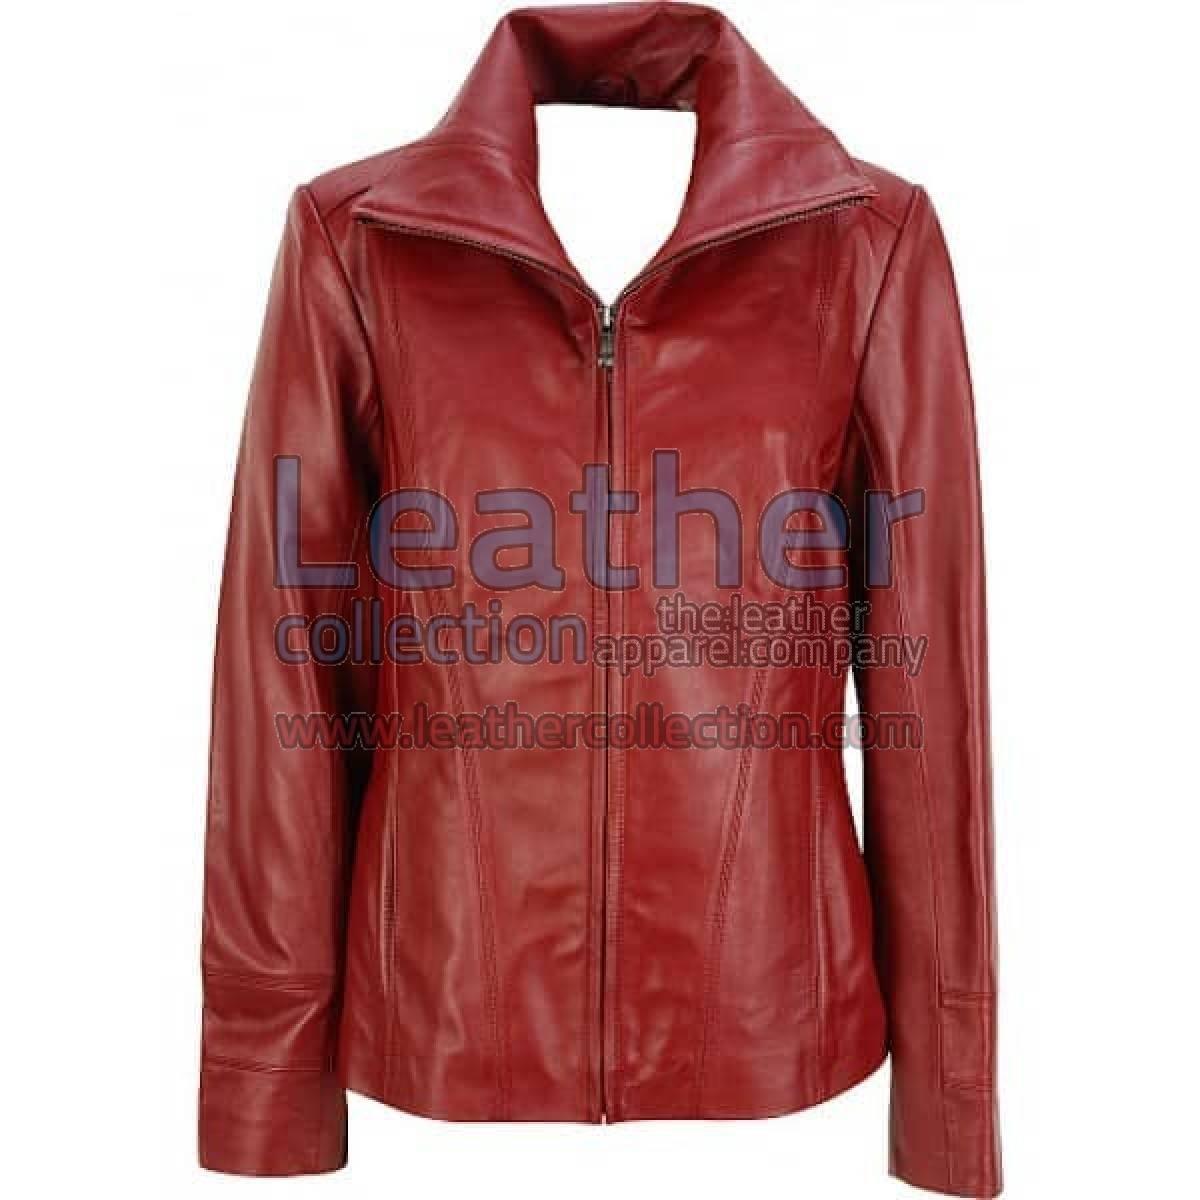 Dark Red Leather Fashion Jacket